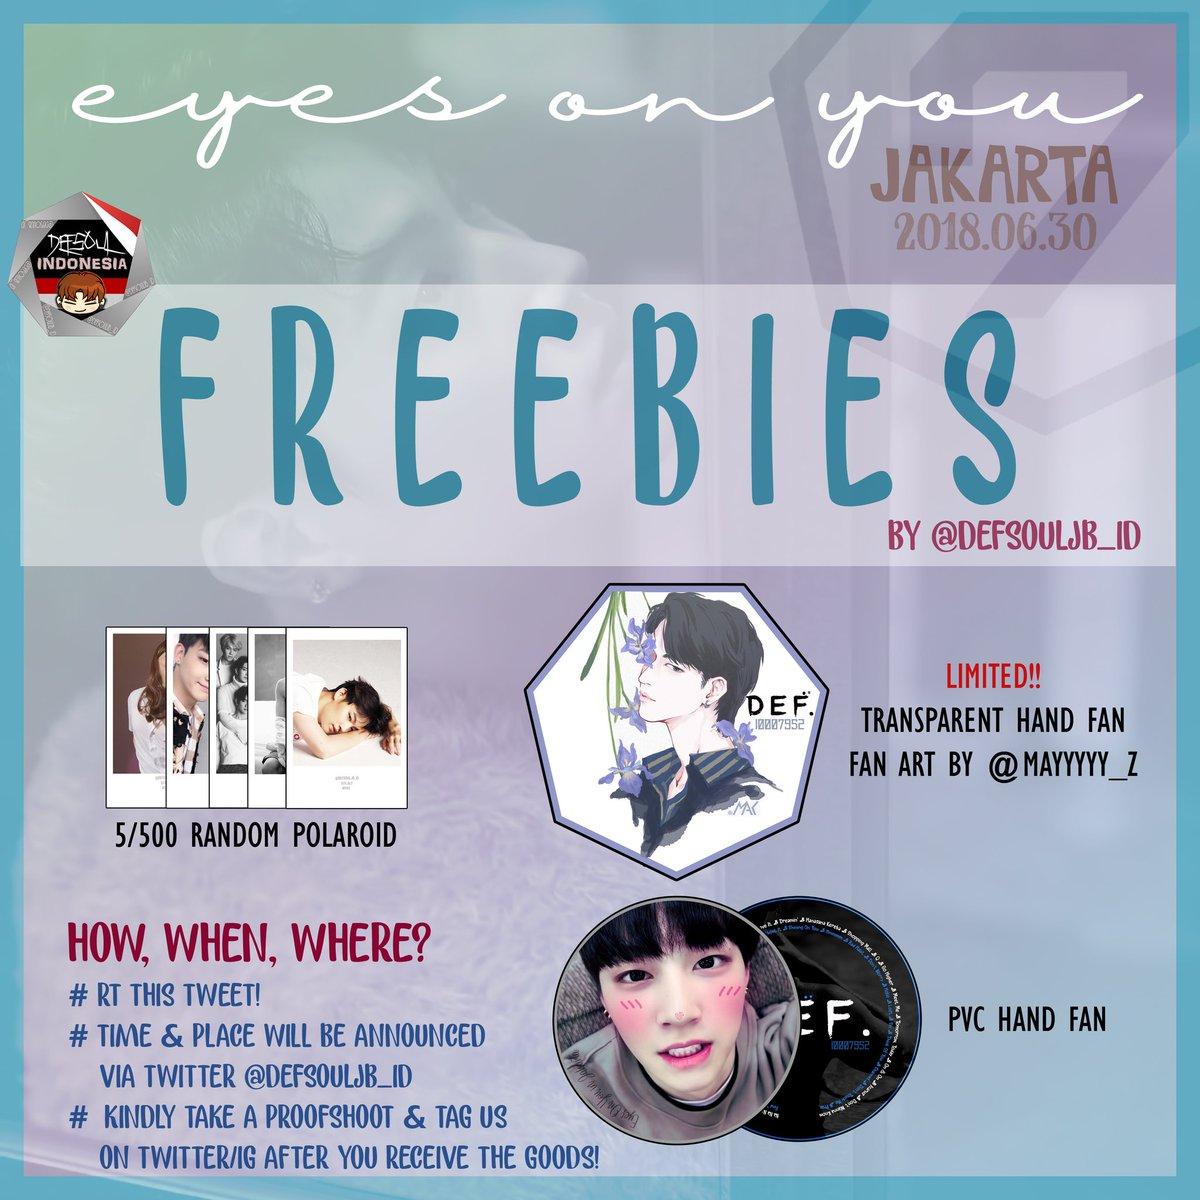 #EyesOnYouinJKT Freebies Fansupport by @DEFSOULJB_ID    Polaroids Set  PVC Hand Fan   (Limited!) Transparent Hand Fan of beautiful 뽐 FanArt by @Mayyyyy_Z   Special Giveaway &amp; Lucky Draw  Kindly help RT and share~   #EyesOnYouinJakarta #GOT7inJKT #GOT7 <br>http://pic.twitter.com/yM7cIbmxL3